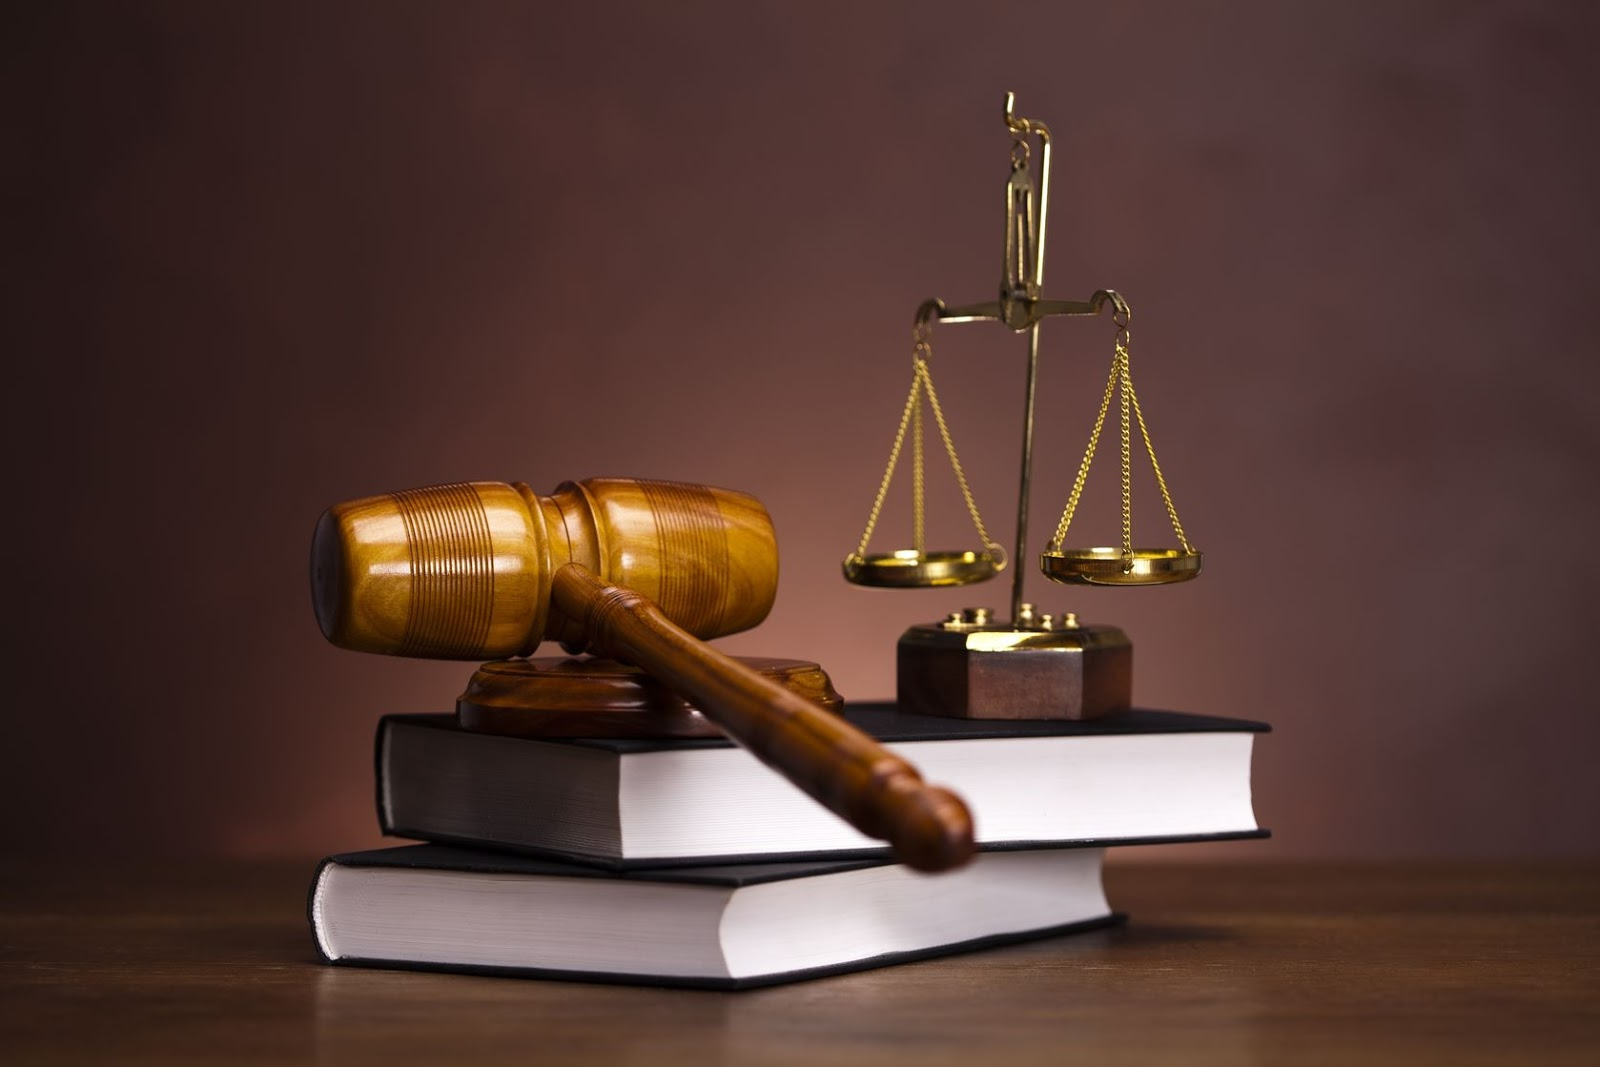 oab decide como deve ser o cartao de visita de um advogado - OAB determina como deve ser o cartão de visitas de advogado